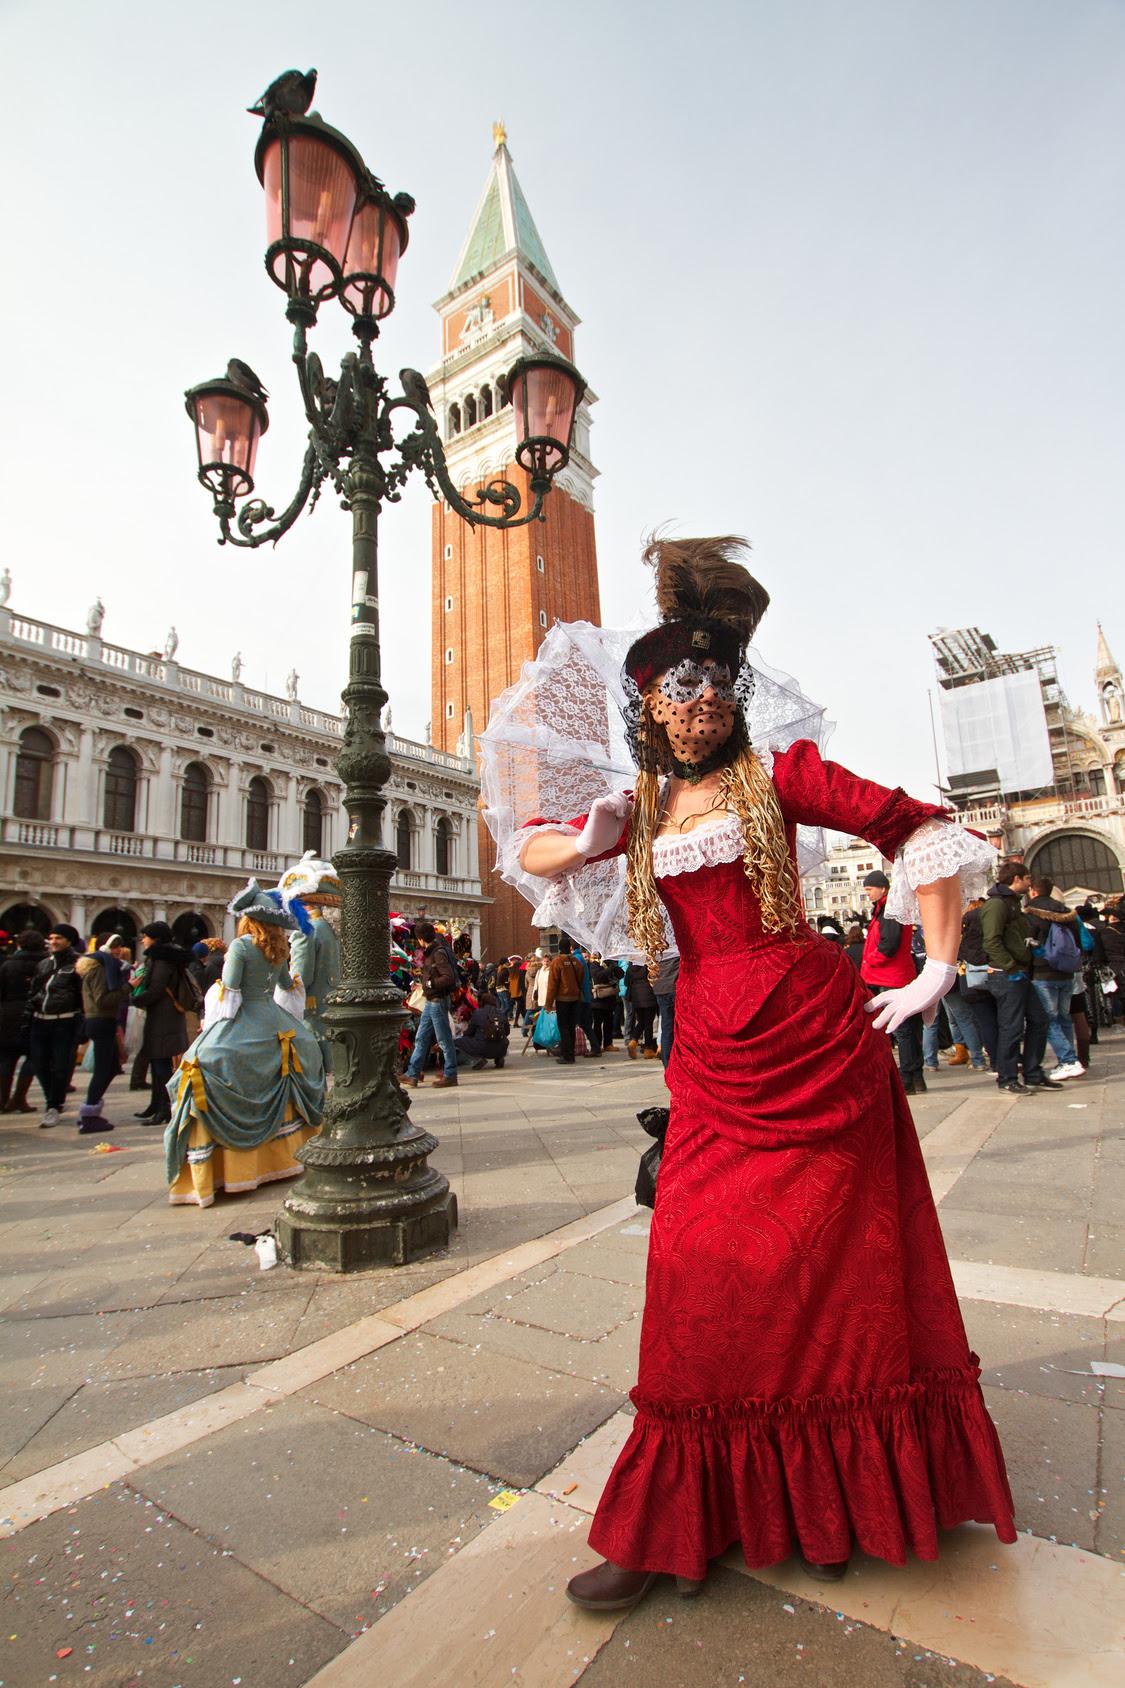 SanMarco_costumedwoman